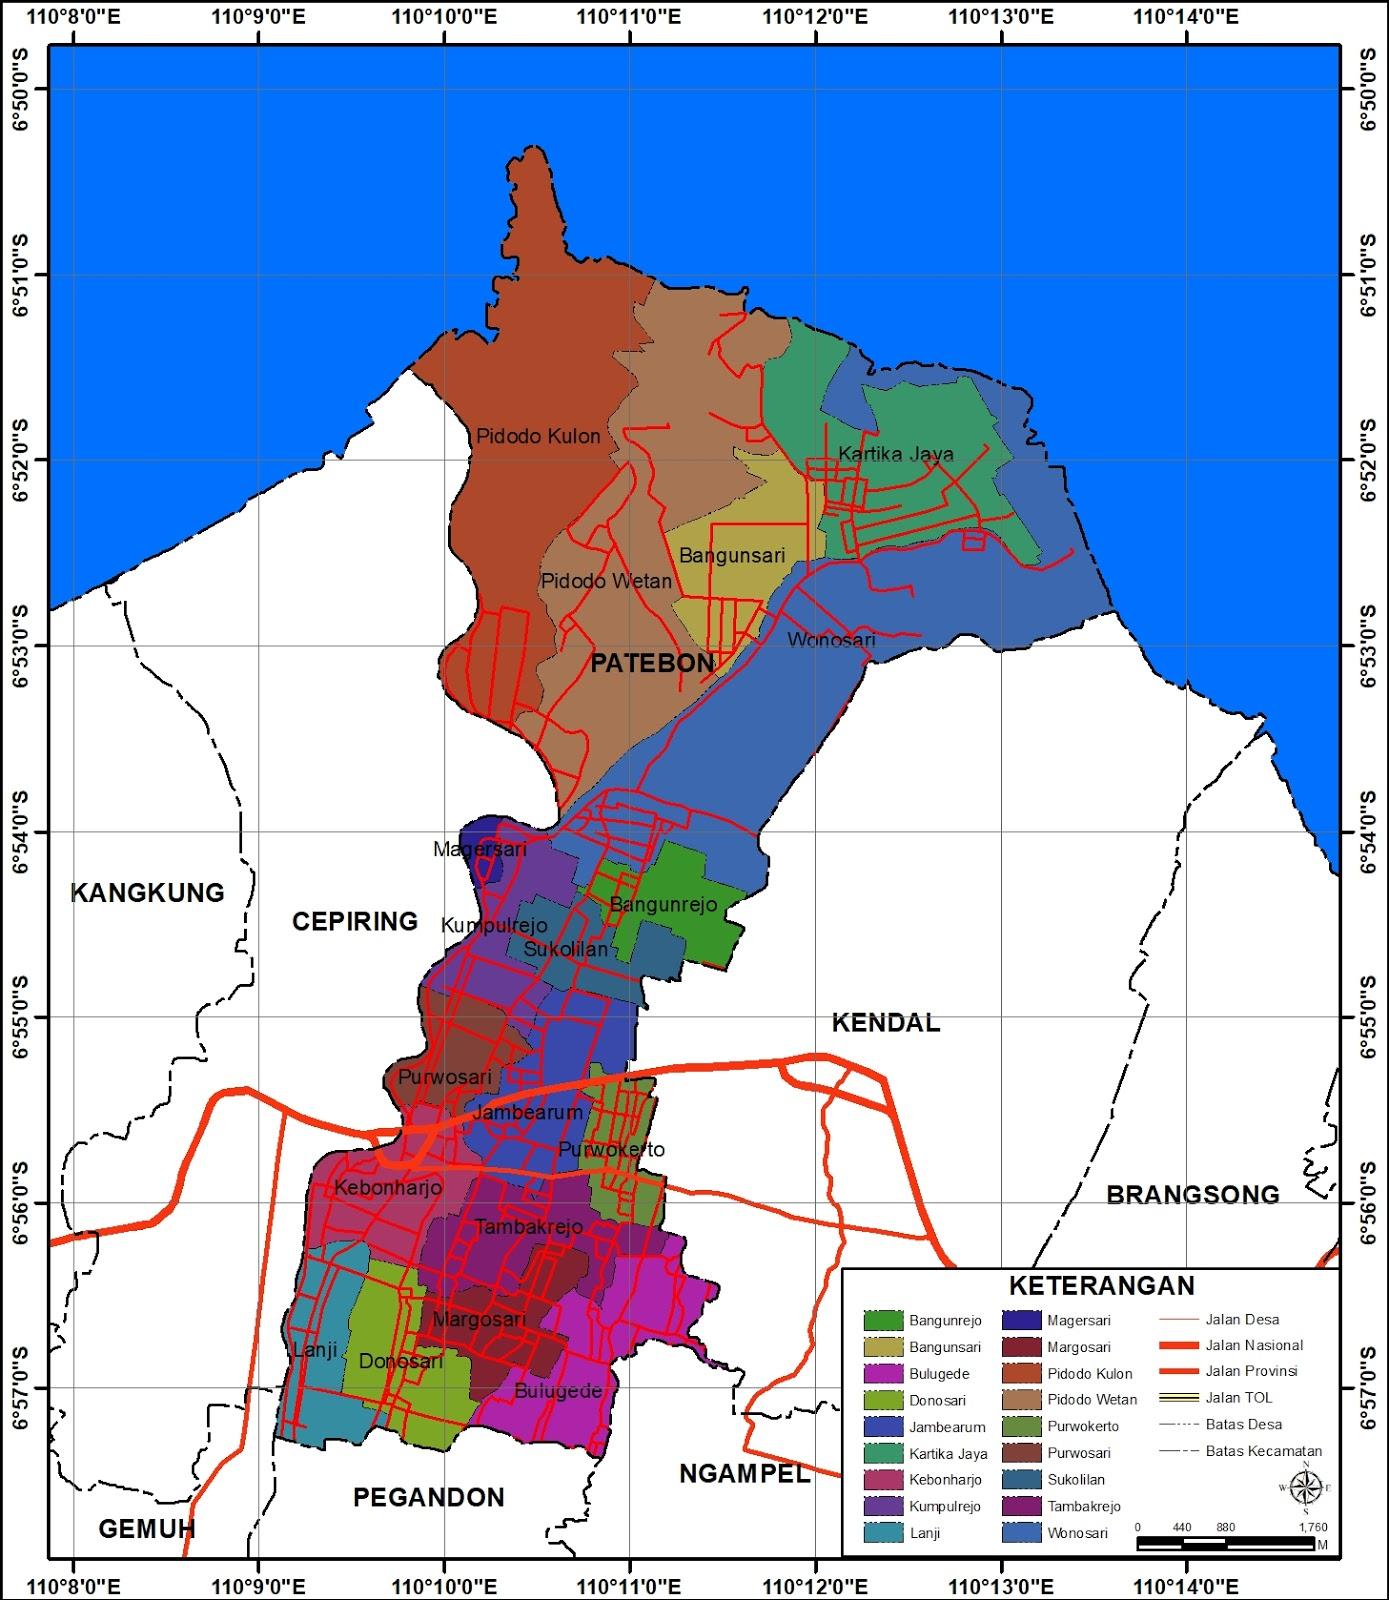 Peta Administrasi Kecamatan Patebon, Kabupaten Kendal ...